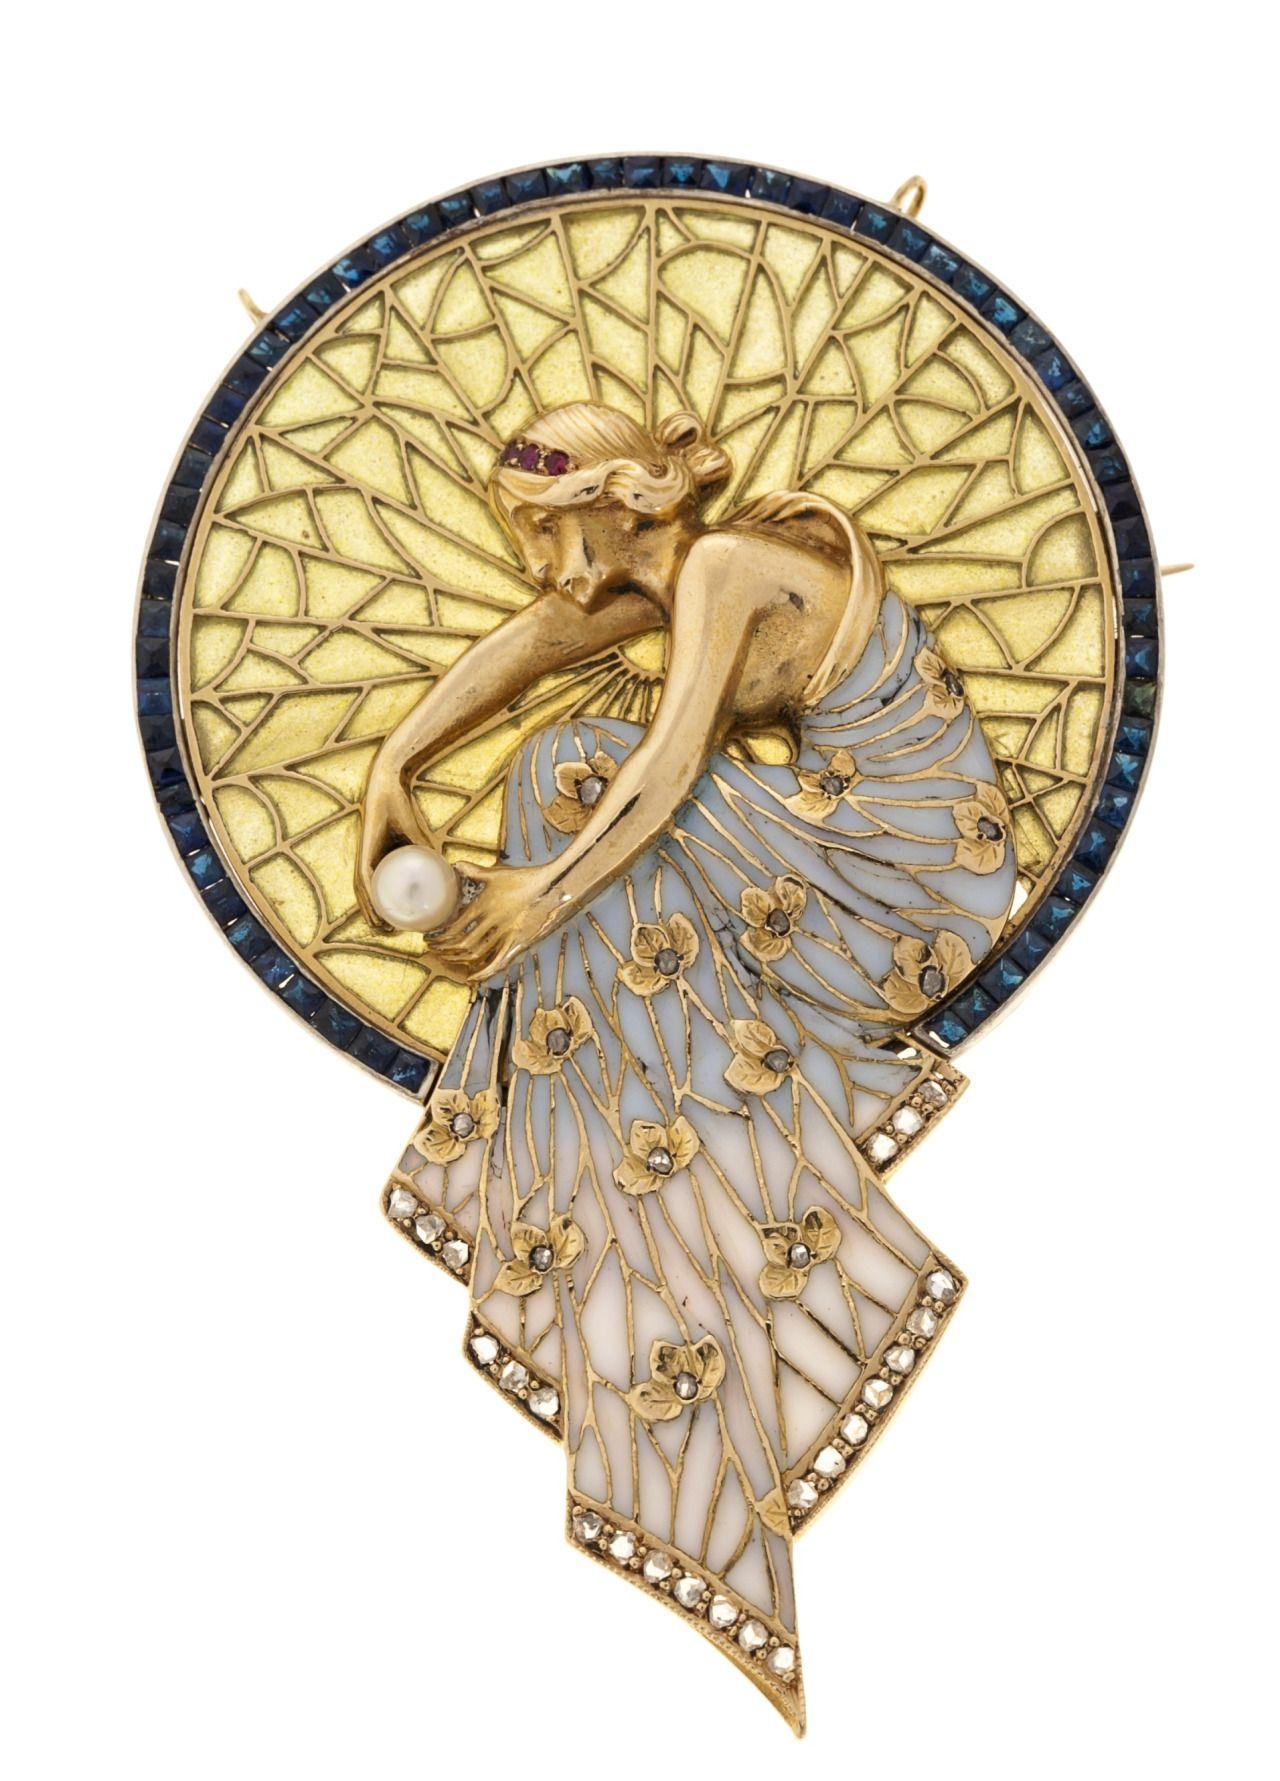 Art Nouveau pendants by jeweler Lluís Masriera i Rosés (1872-1958). Images from wikipedia.